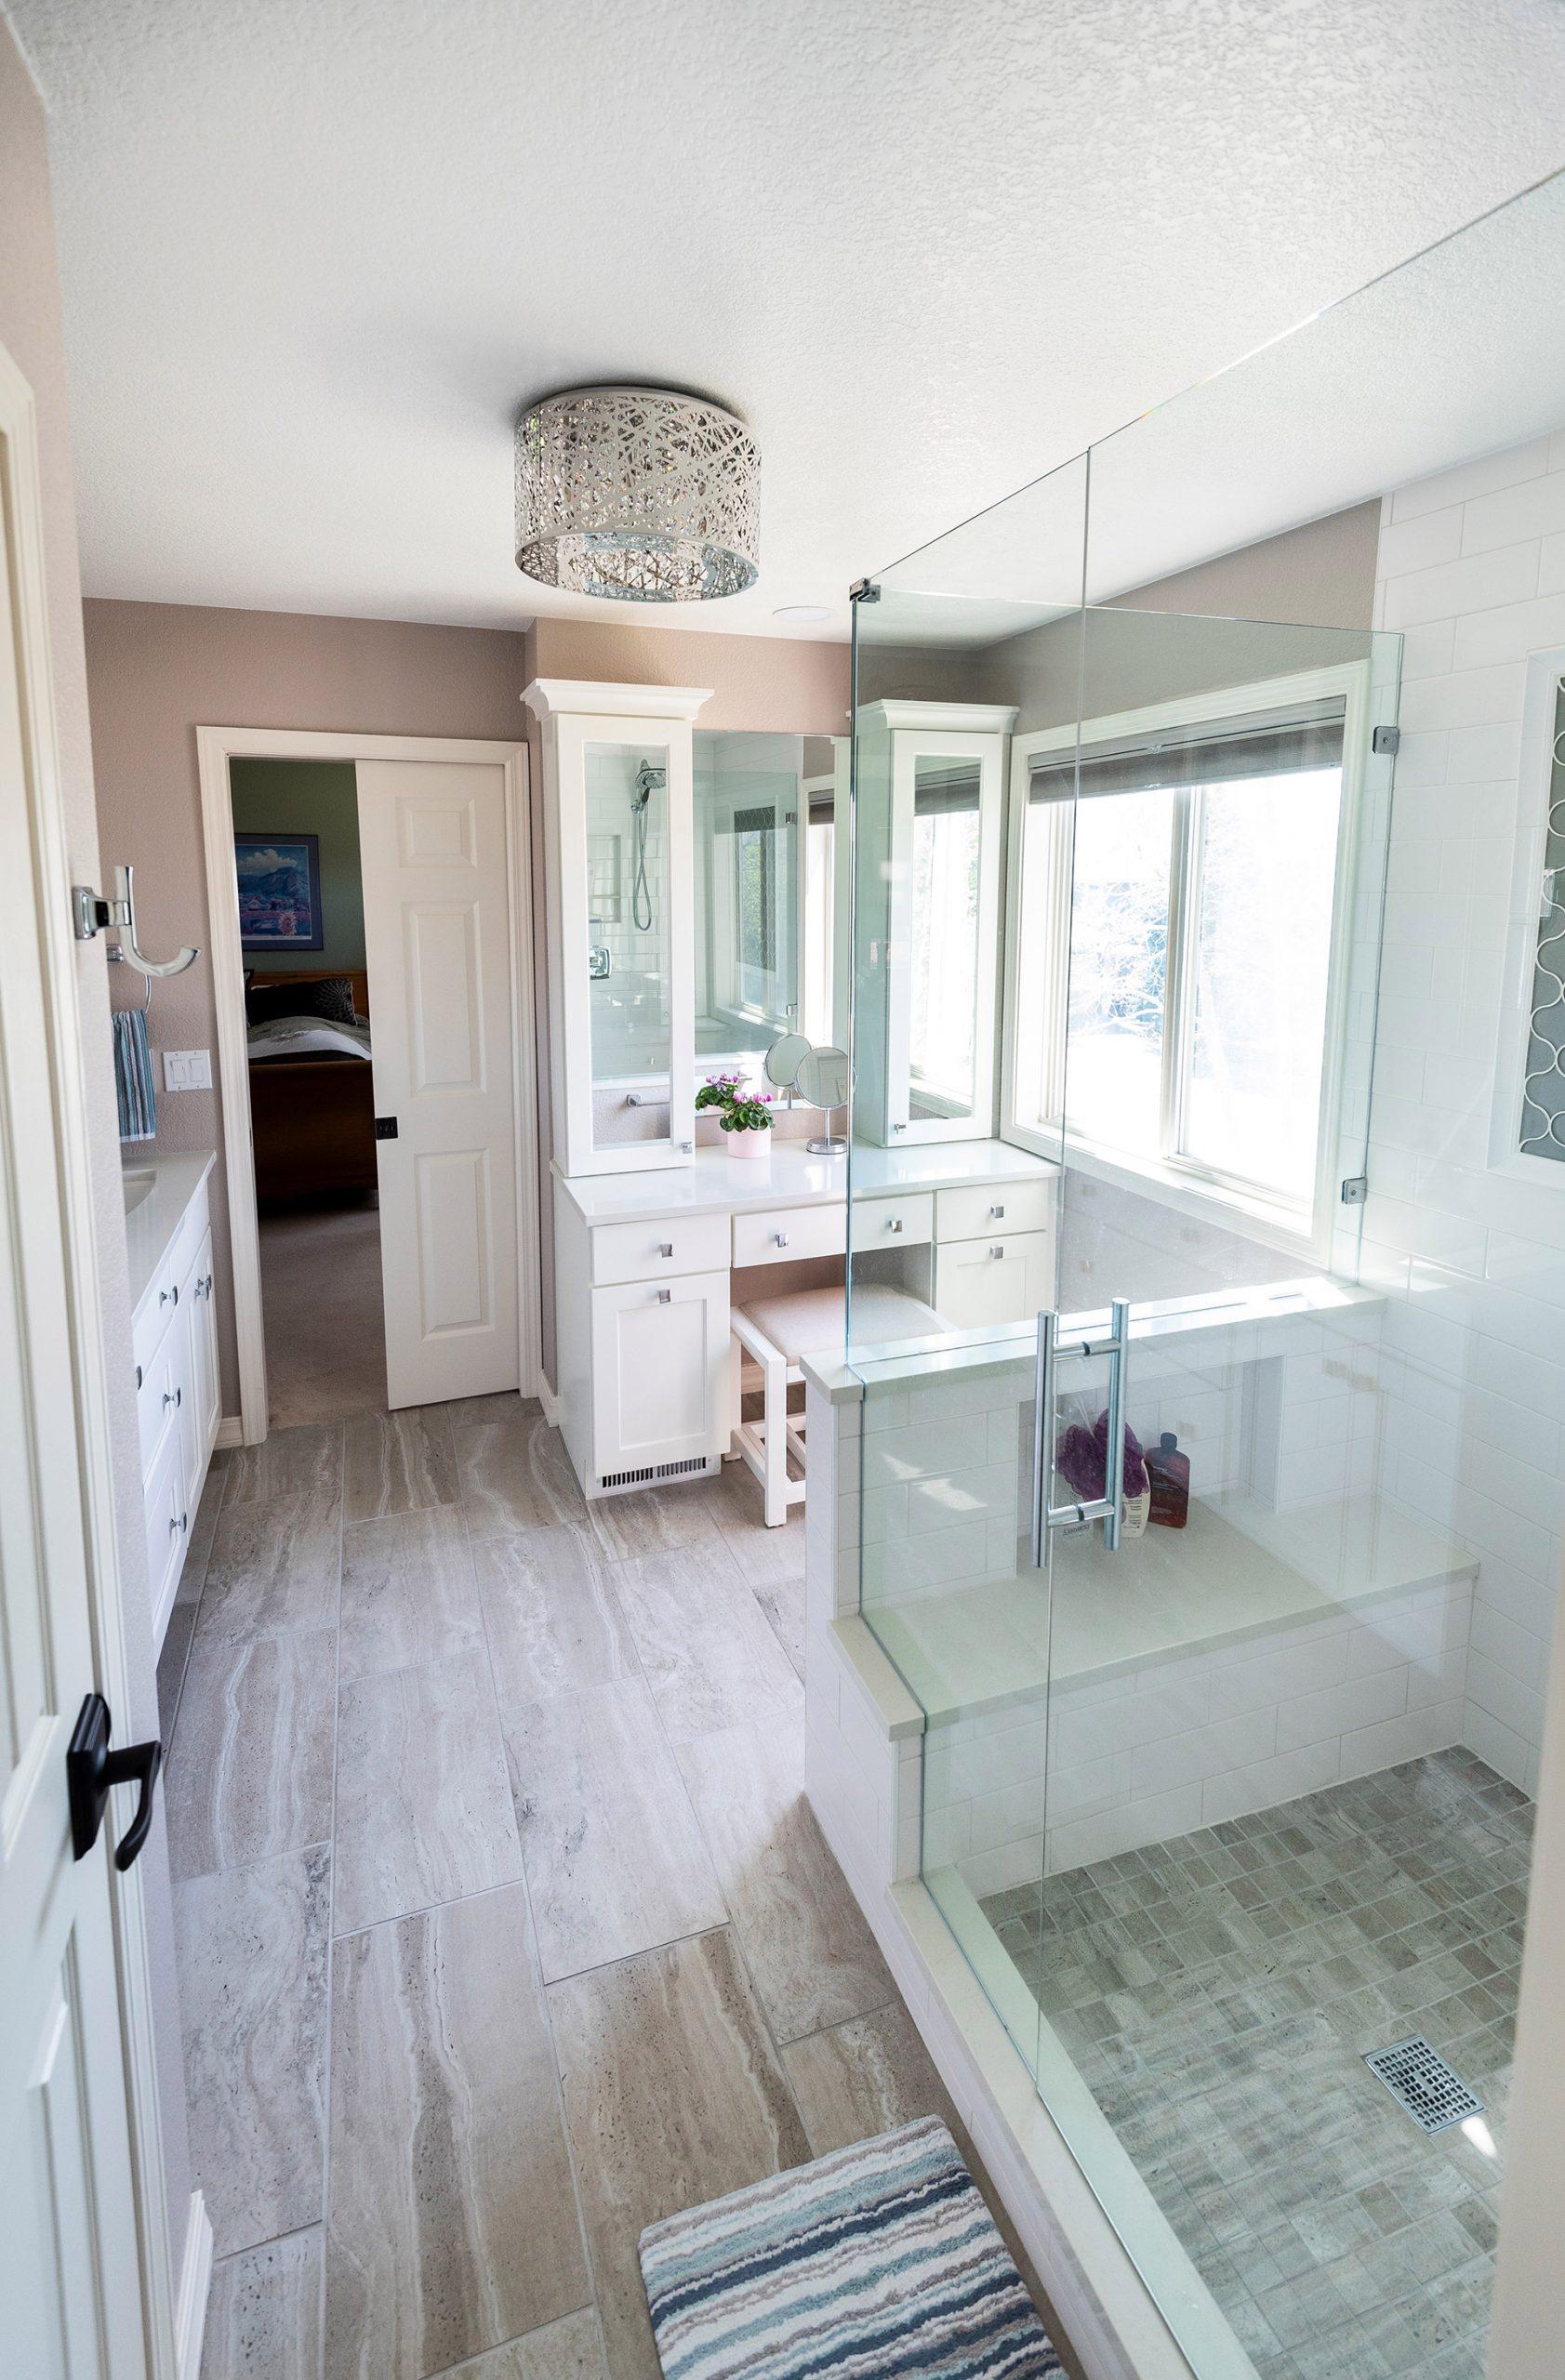 20190503 mccarty bathroom 7 crop 1 scaled